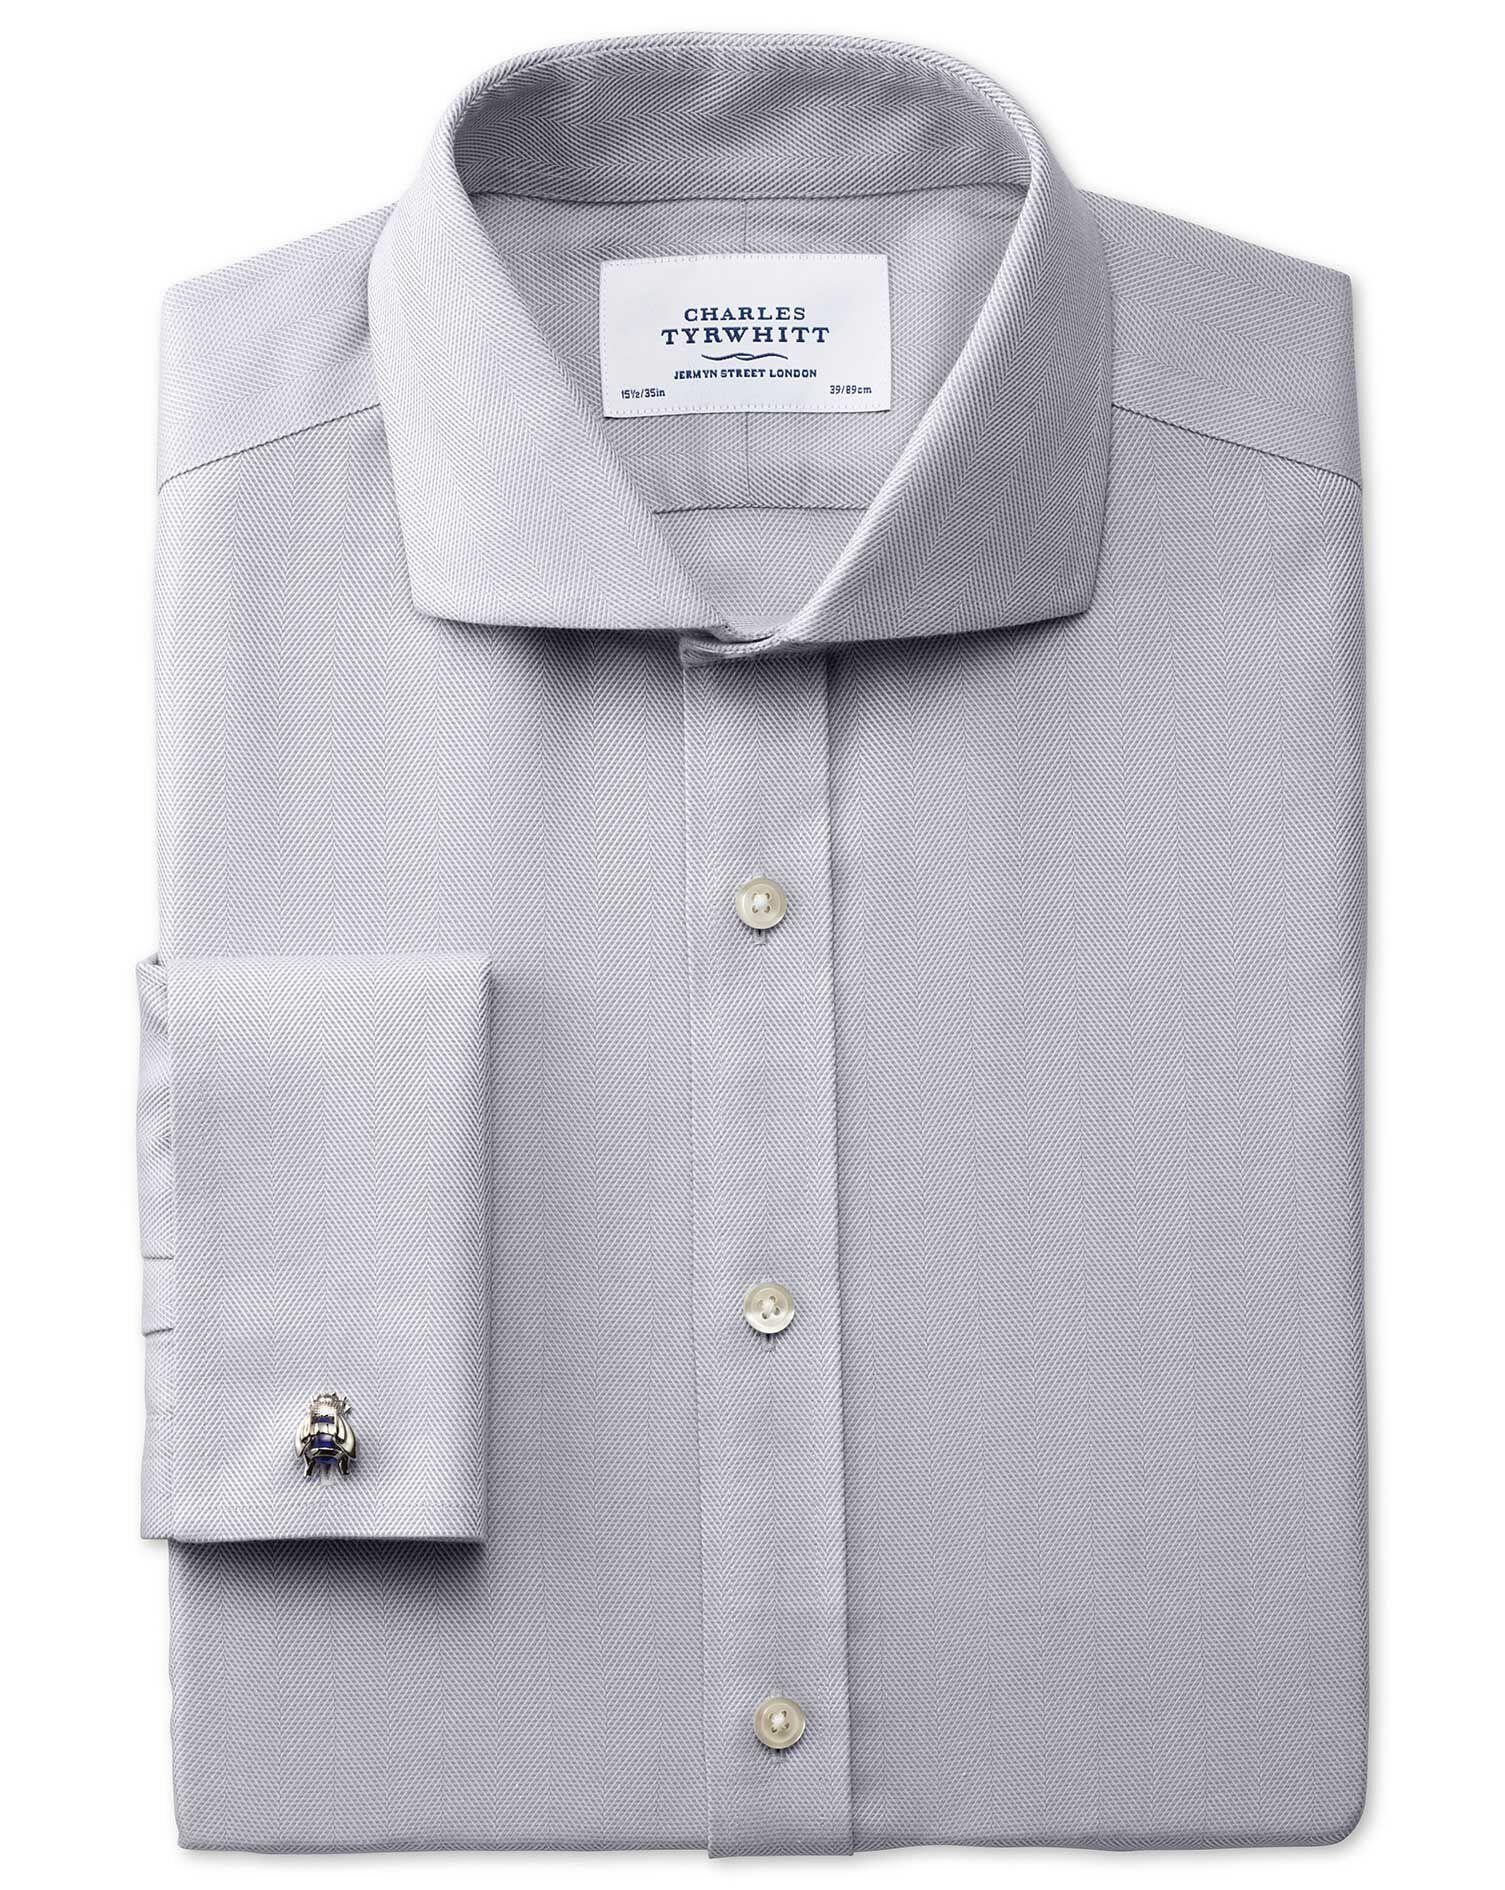 Extra Slim Fit Cutaway Collar Non-Iron Herringbone Grey Cotton Formal Shirt Double Cuff Size 16.5/33